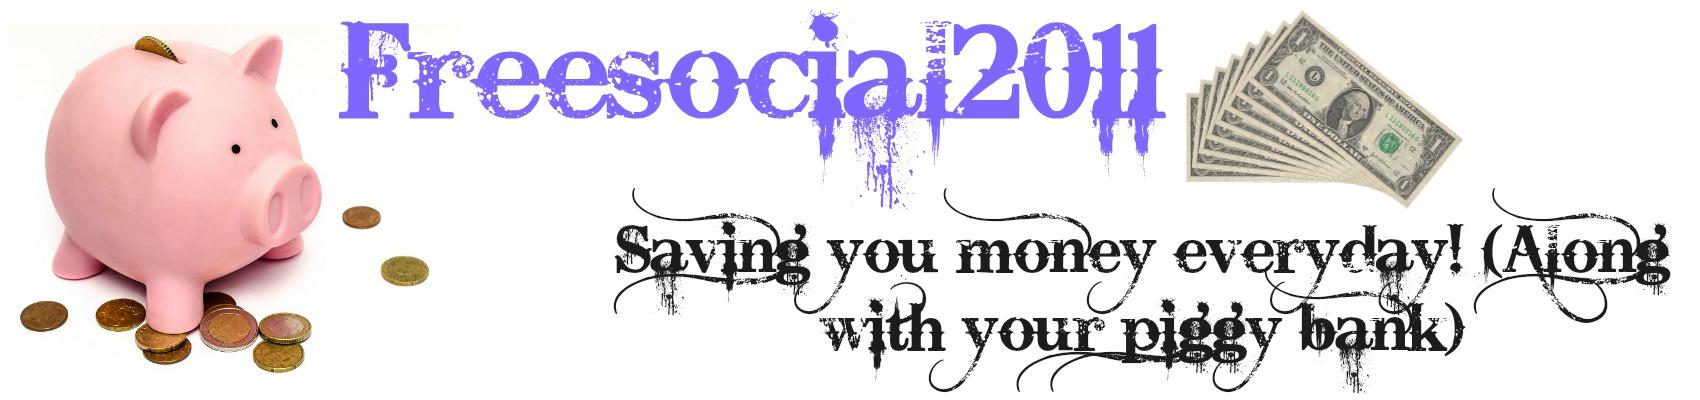 Freesocial2011